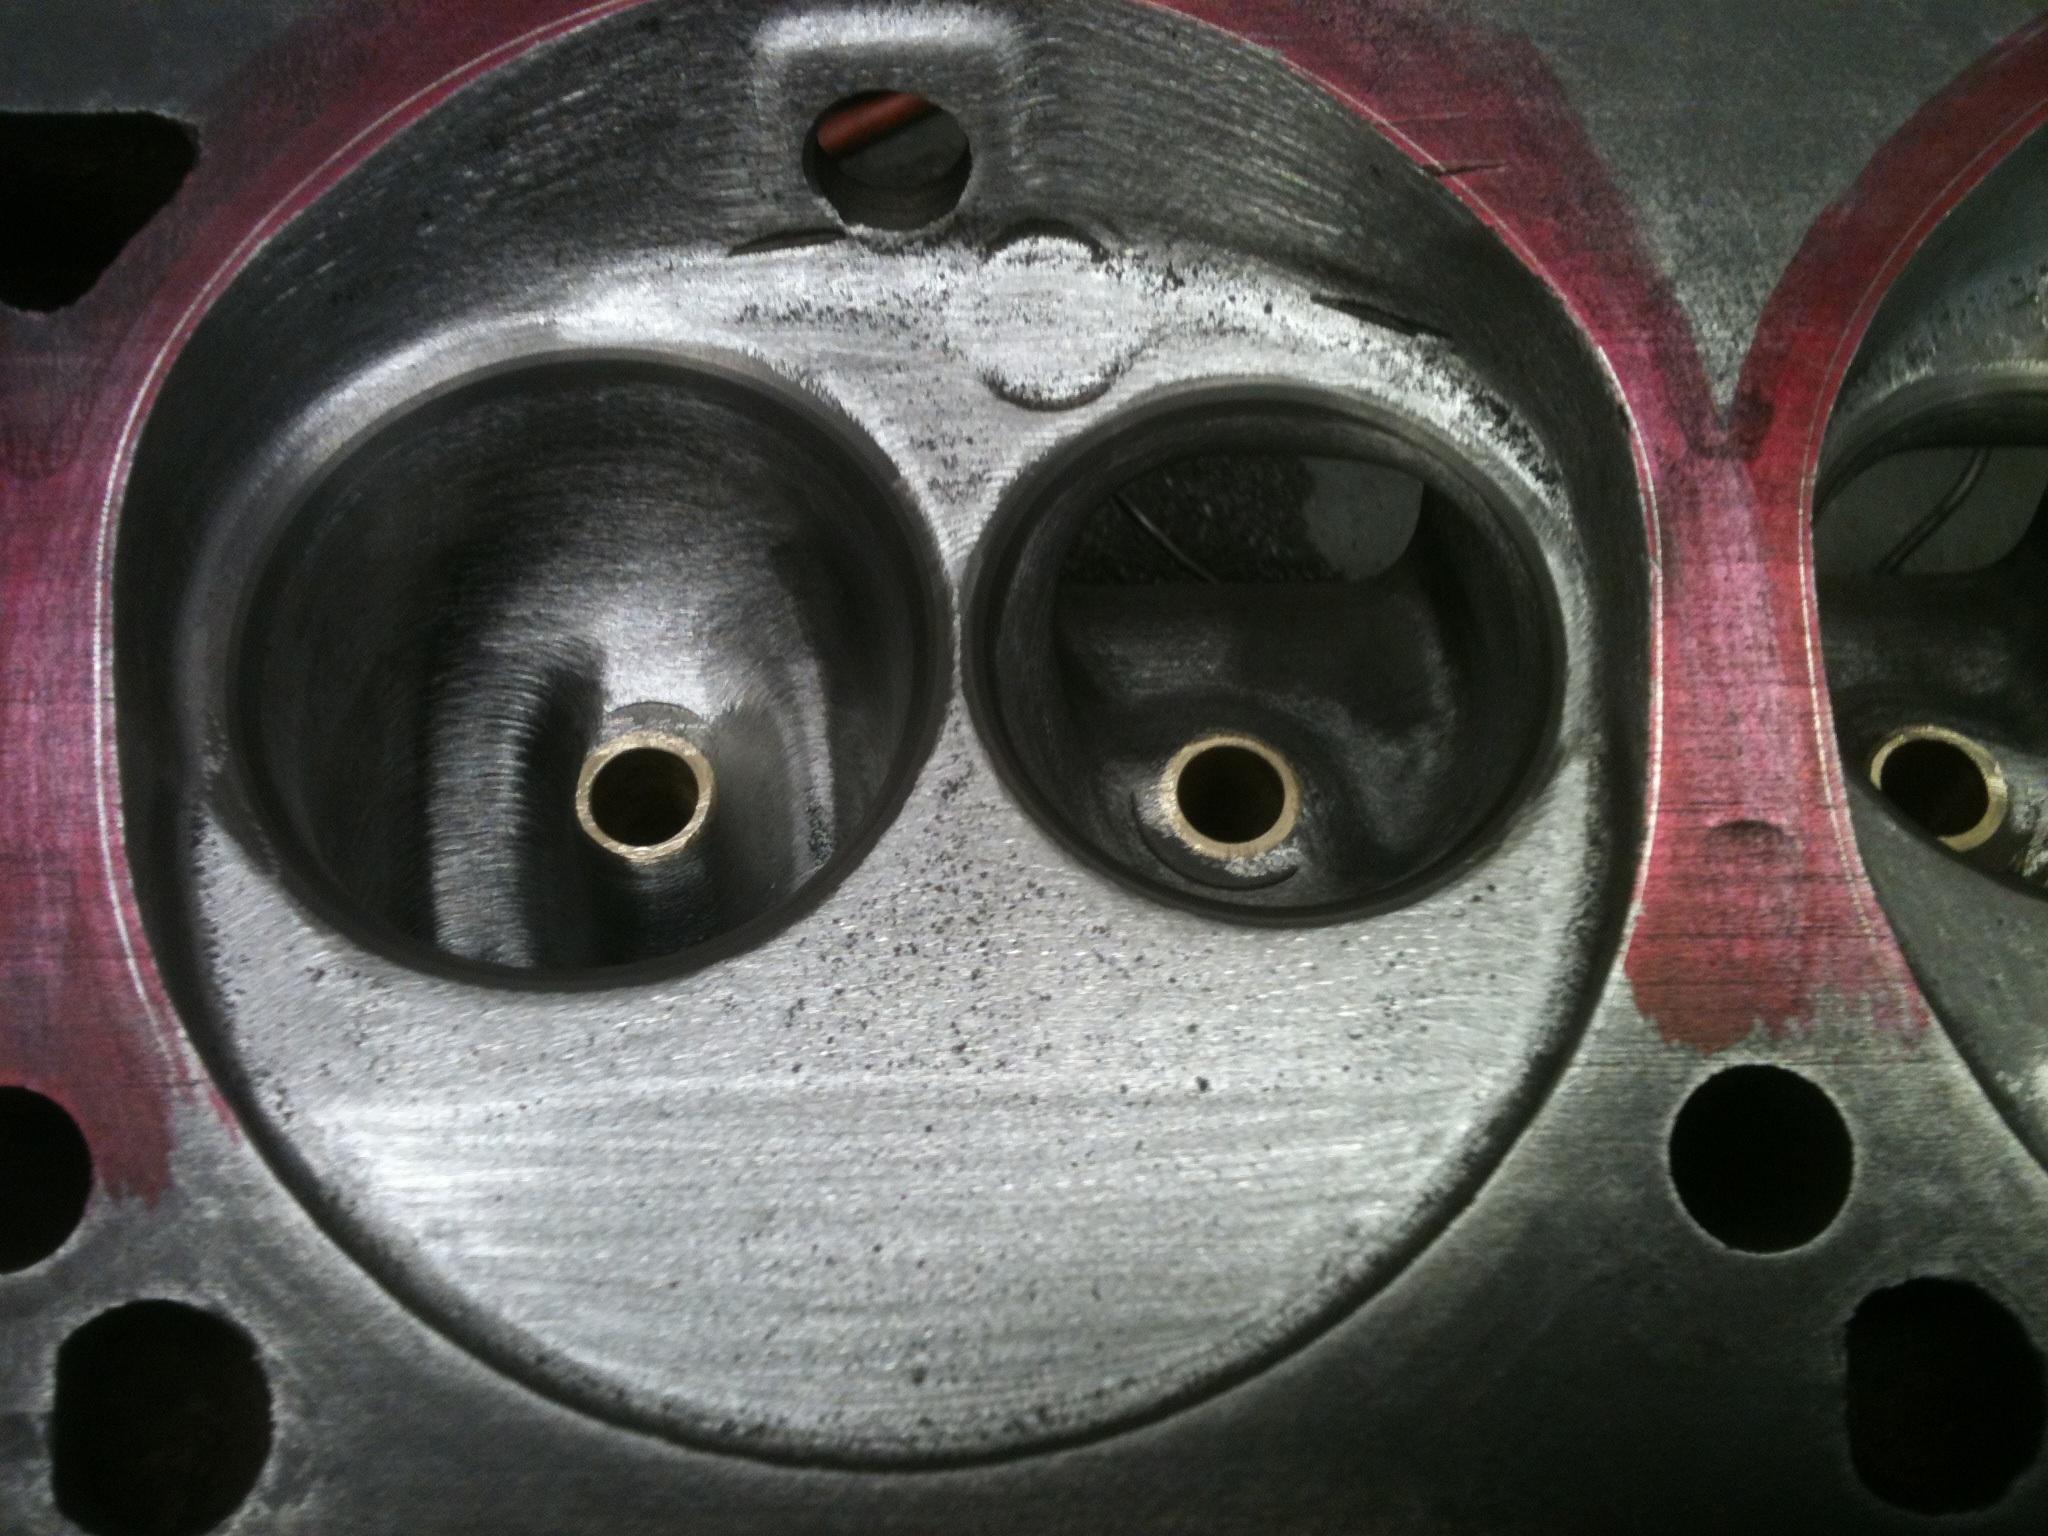 Cnc Porting Iron Heads Unlawfls Race Engine Tech Moparts Forums Http Boardmopartsorg Ubbthreads Wiringdiagjpg Image